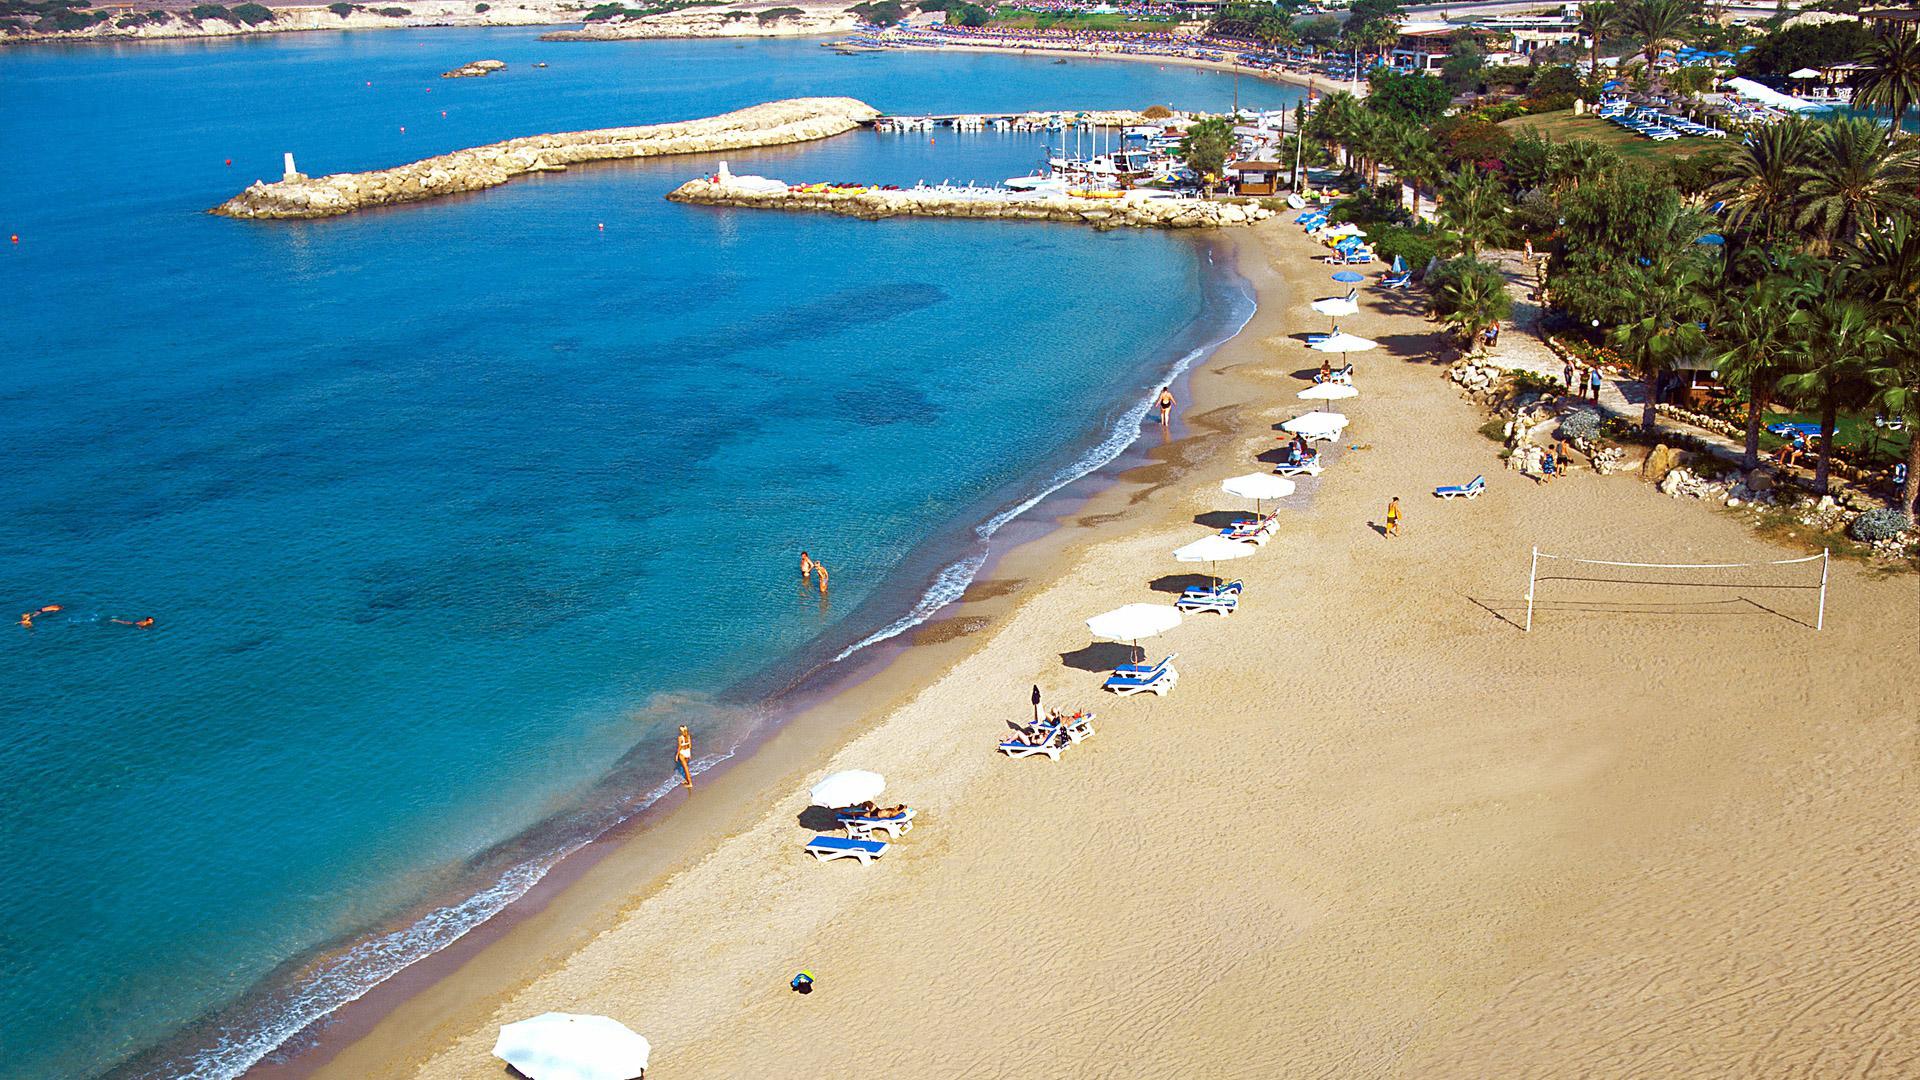 Coral Beach & Resort (Paphos)